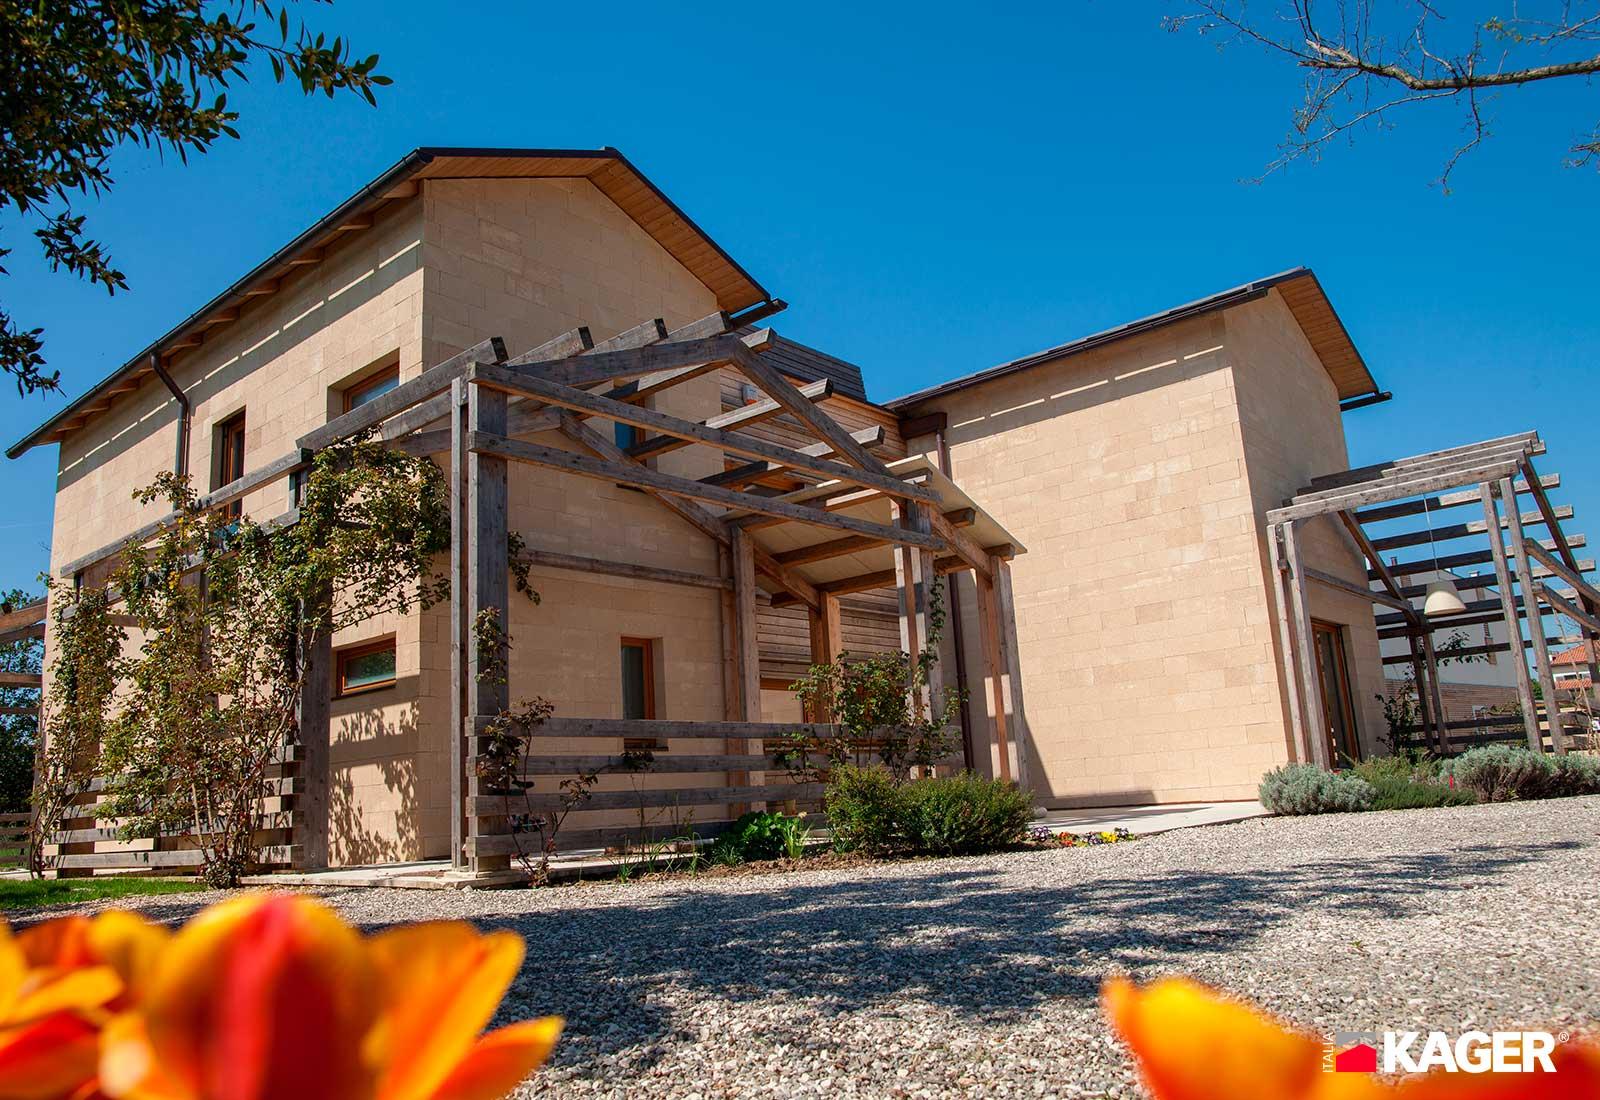 Casa-in-legno-Forli-Kager-Italia-04